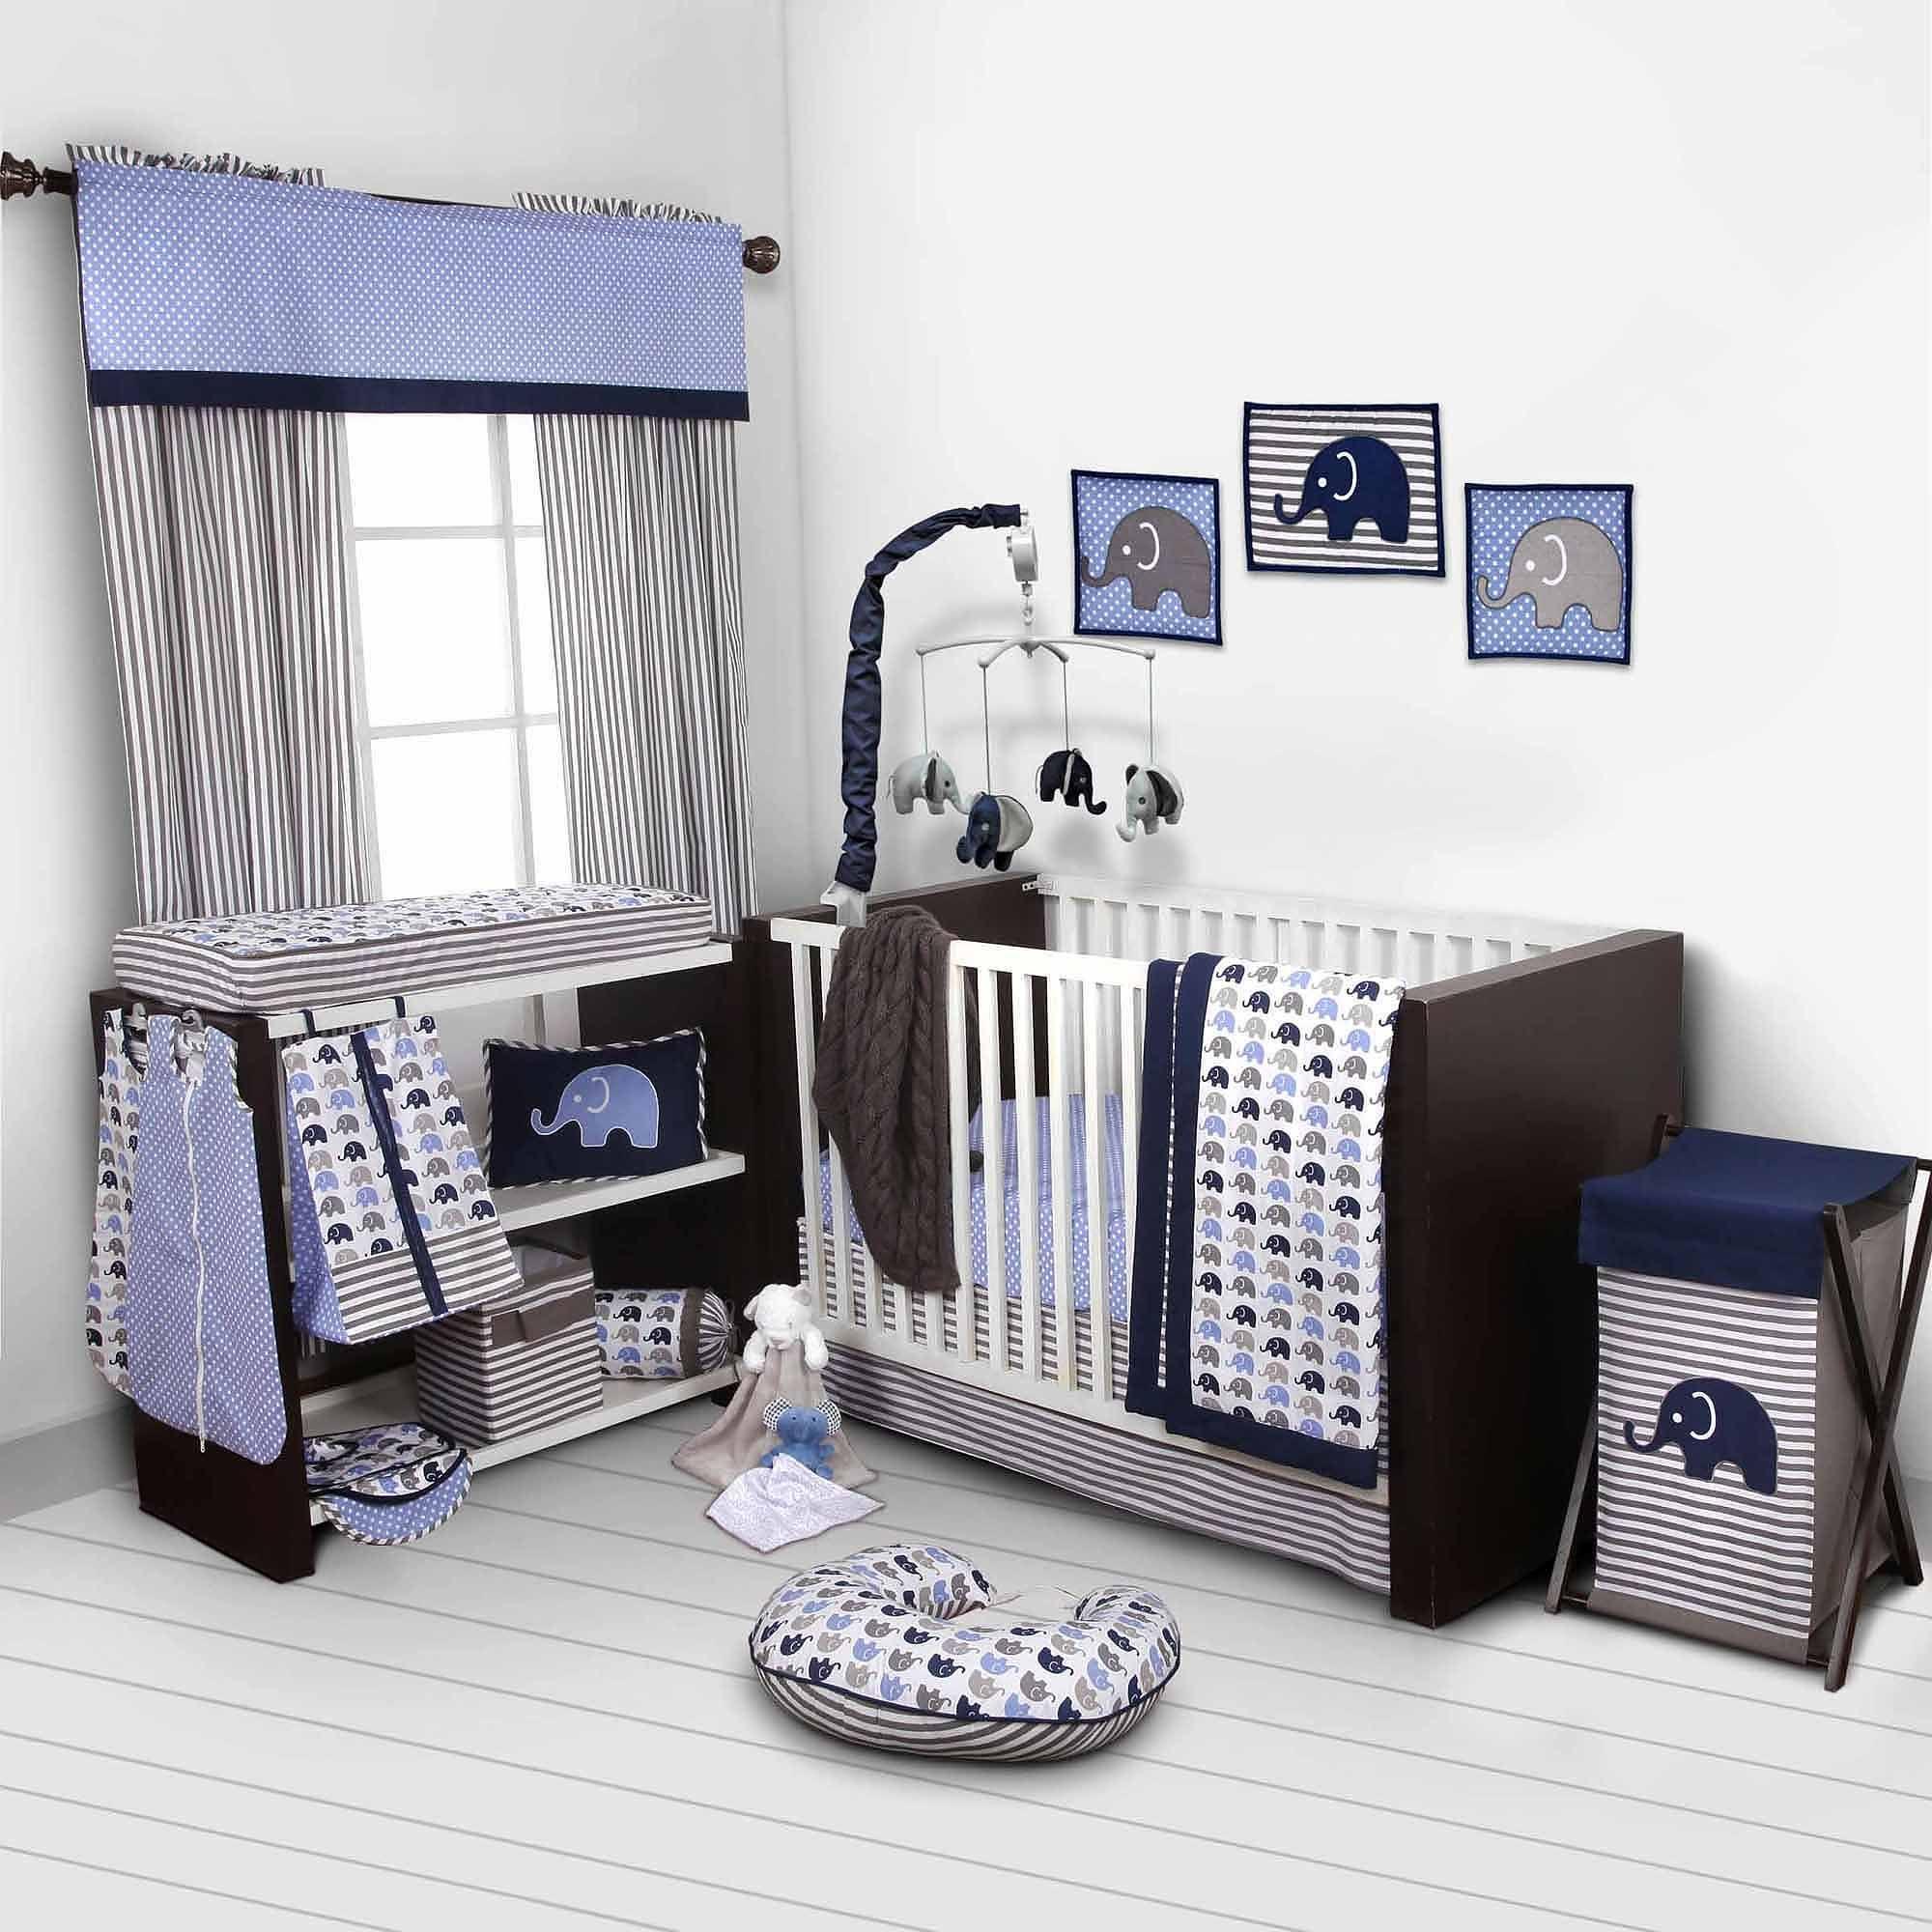 Baby Elephant Crib Bedding Baby Bedding Sets Crib Bedding Sets